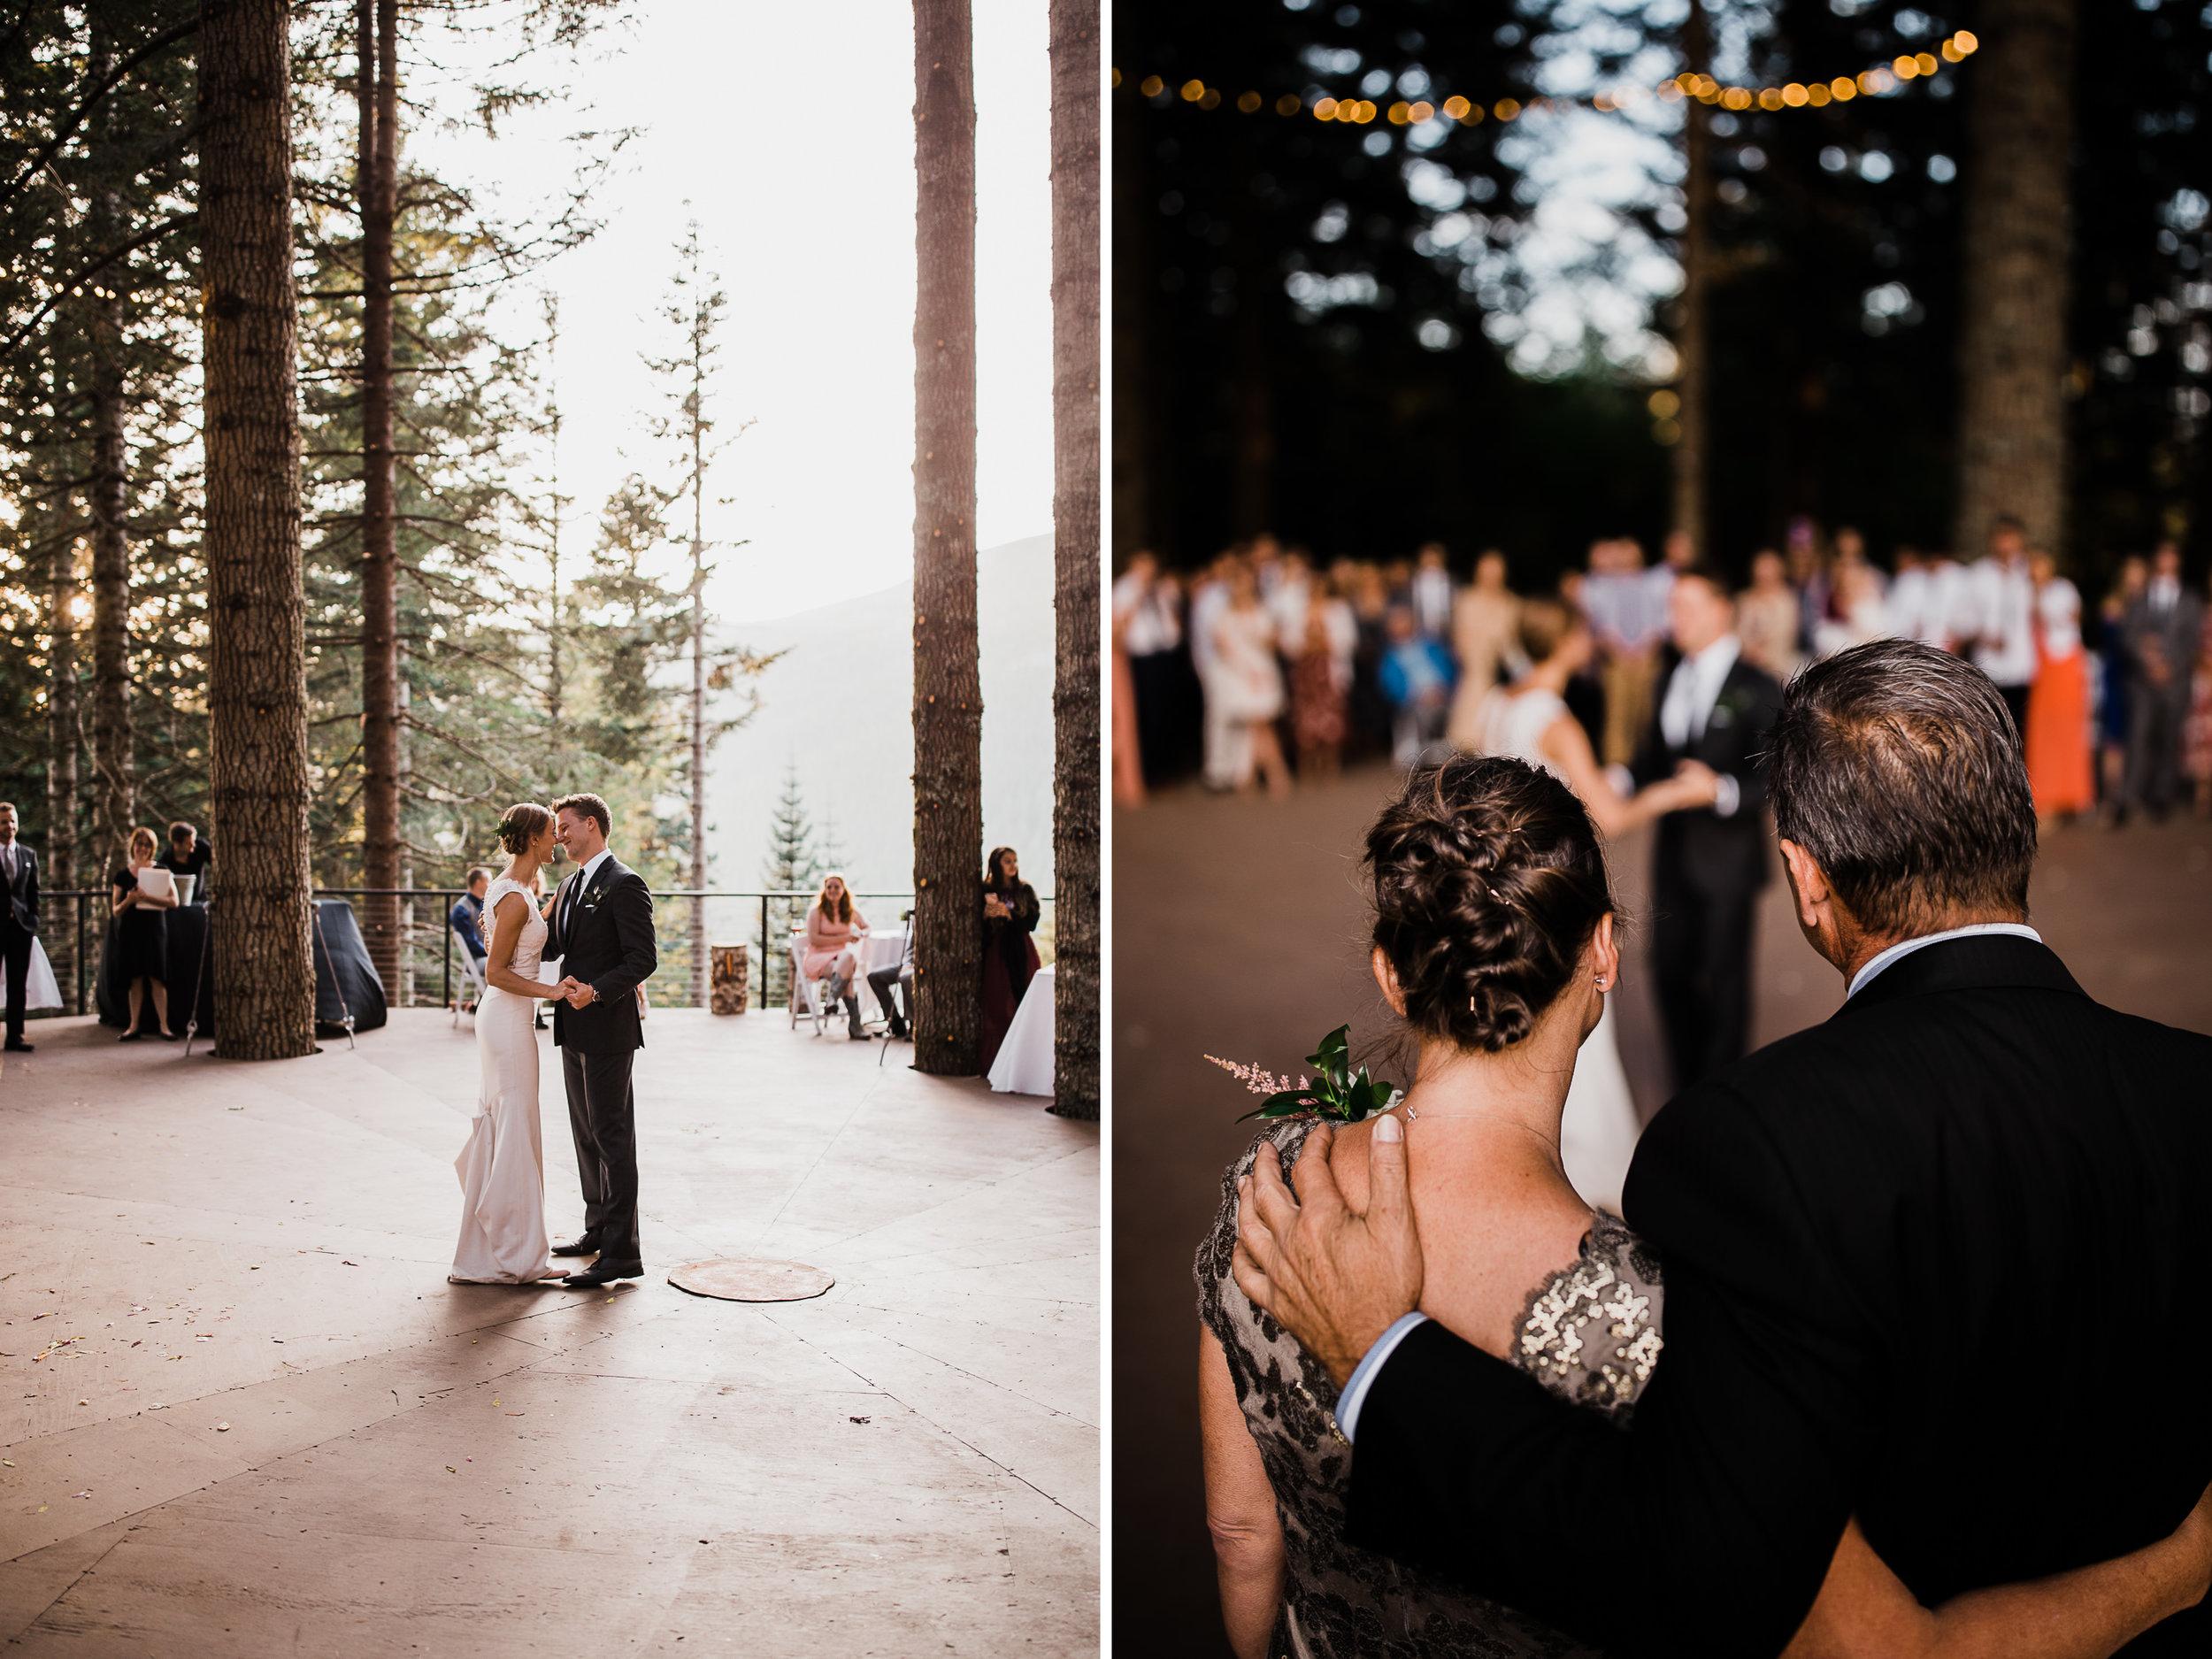 jena + kyler's treehouse wedding | outdoor reception under the stars |washington adventure wedding photographer | the hearnes adventure wedding photography | www.thehearnes.com